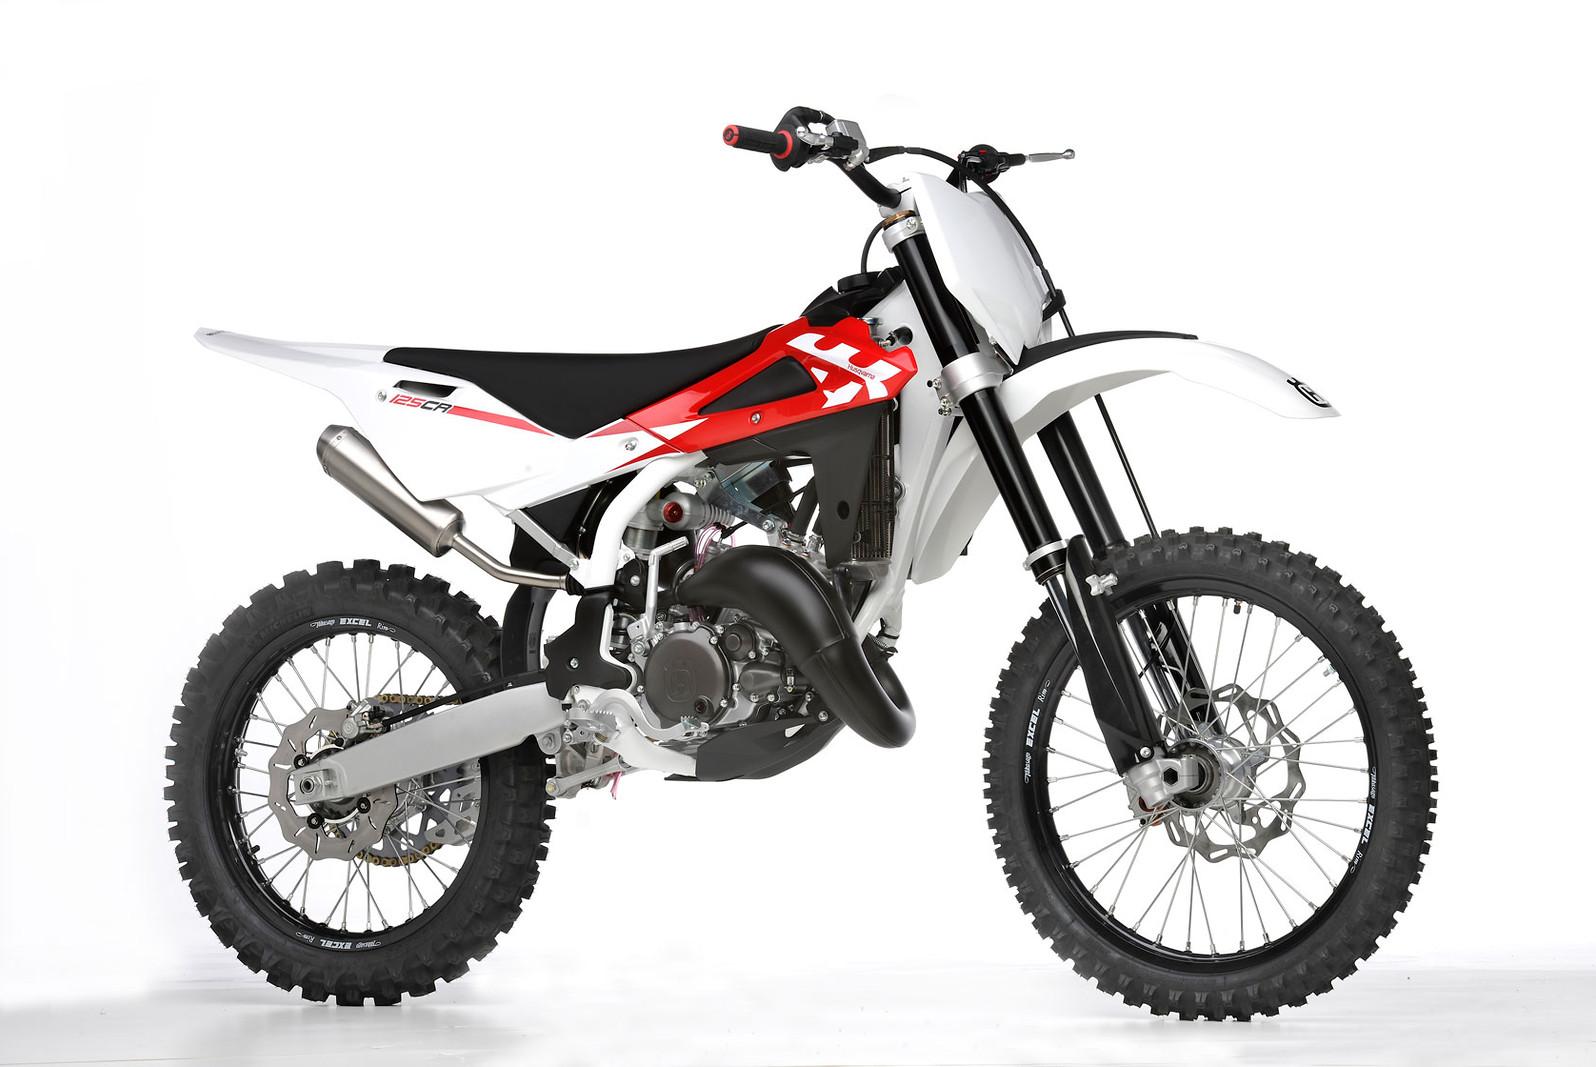 2011 Husqvarna CR150